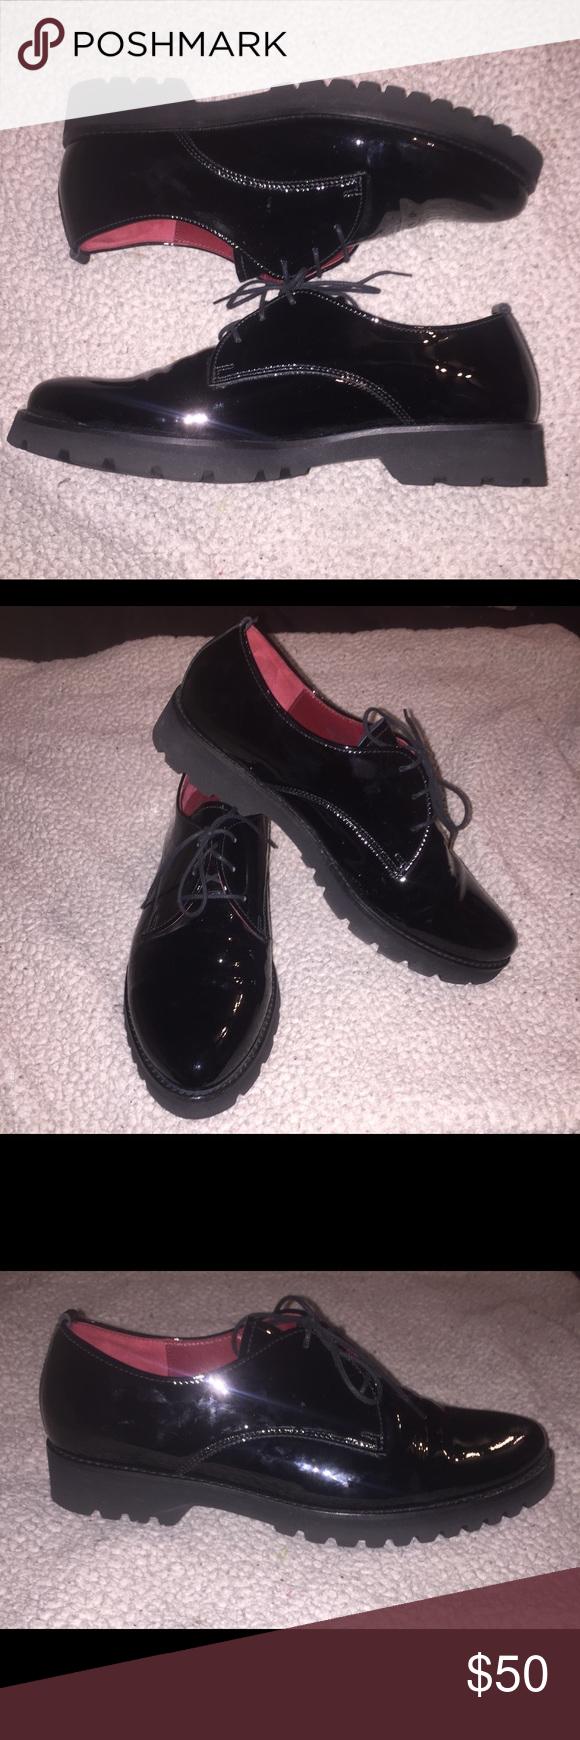 Ladies Gabor shoes size 5 12